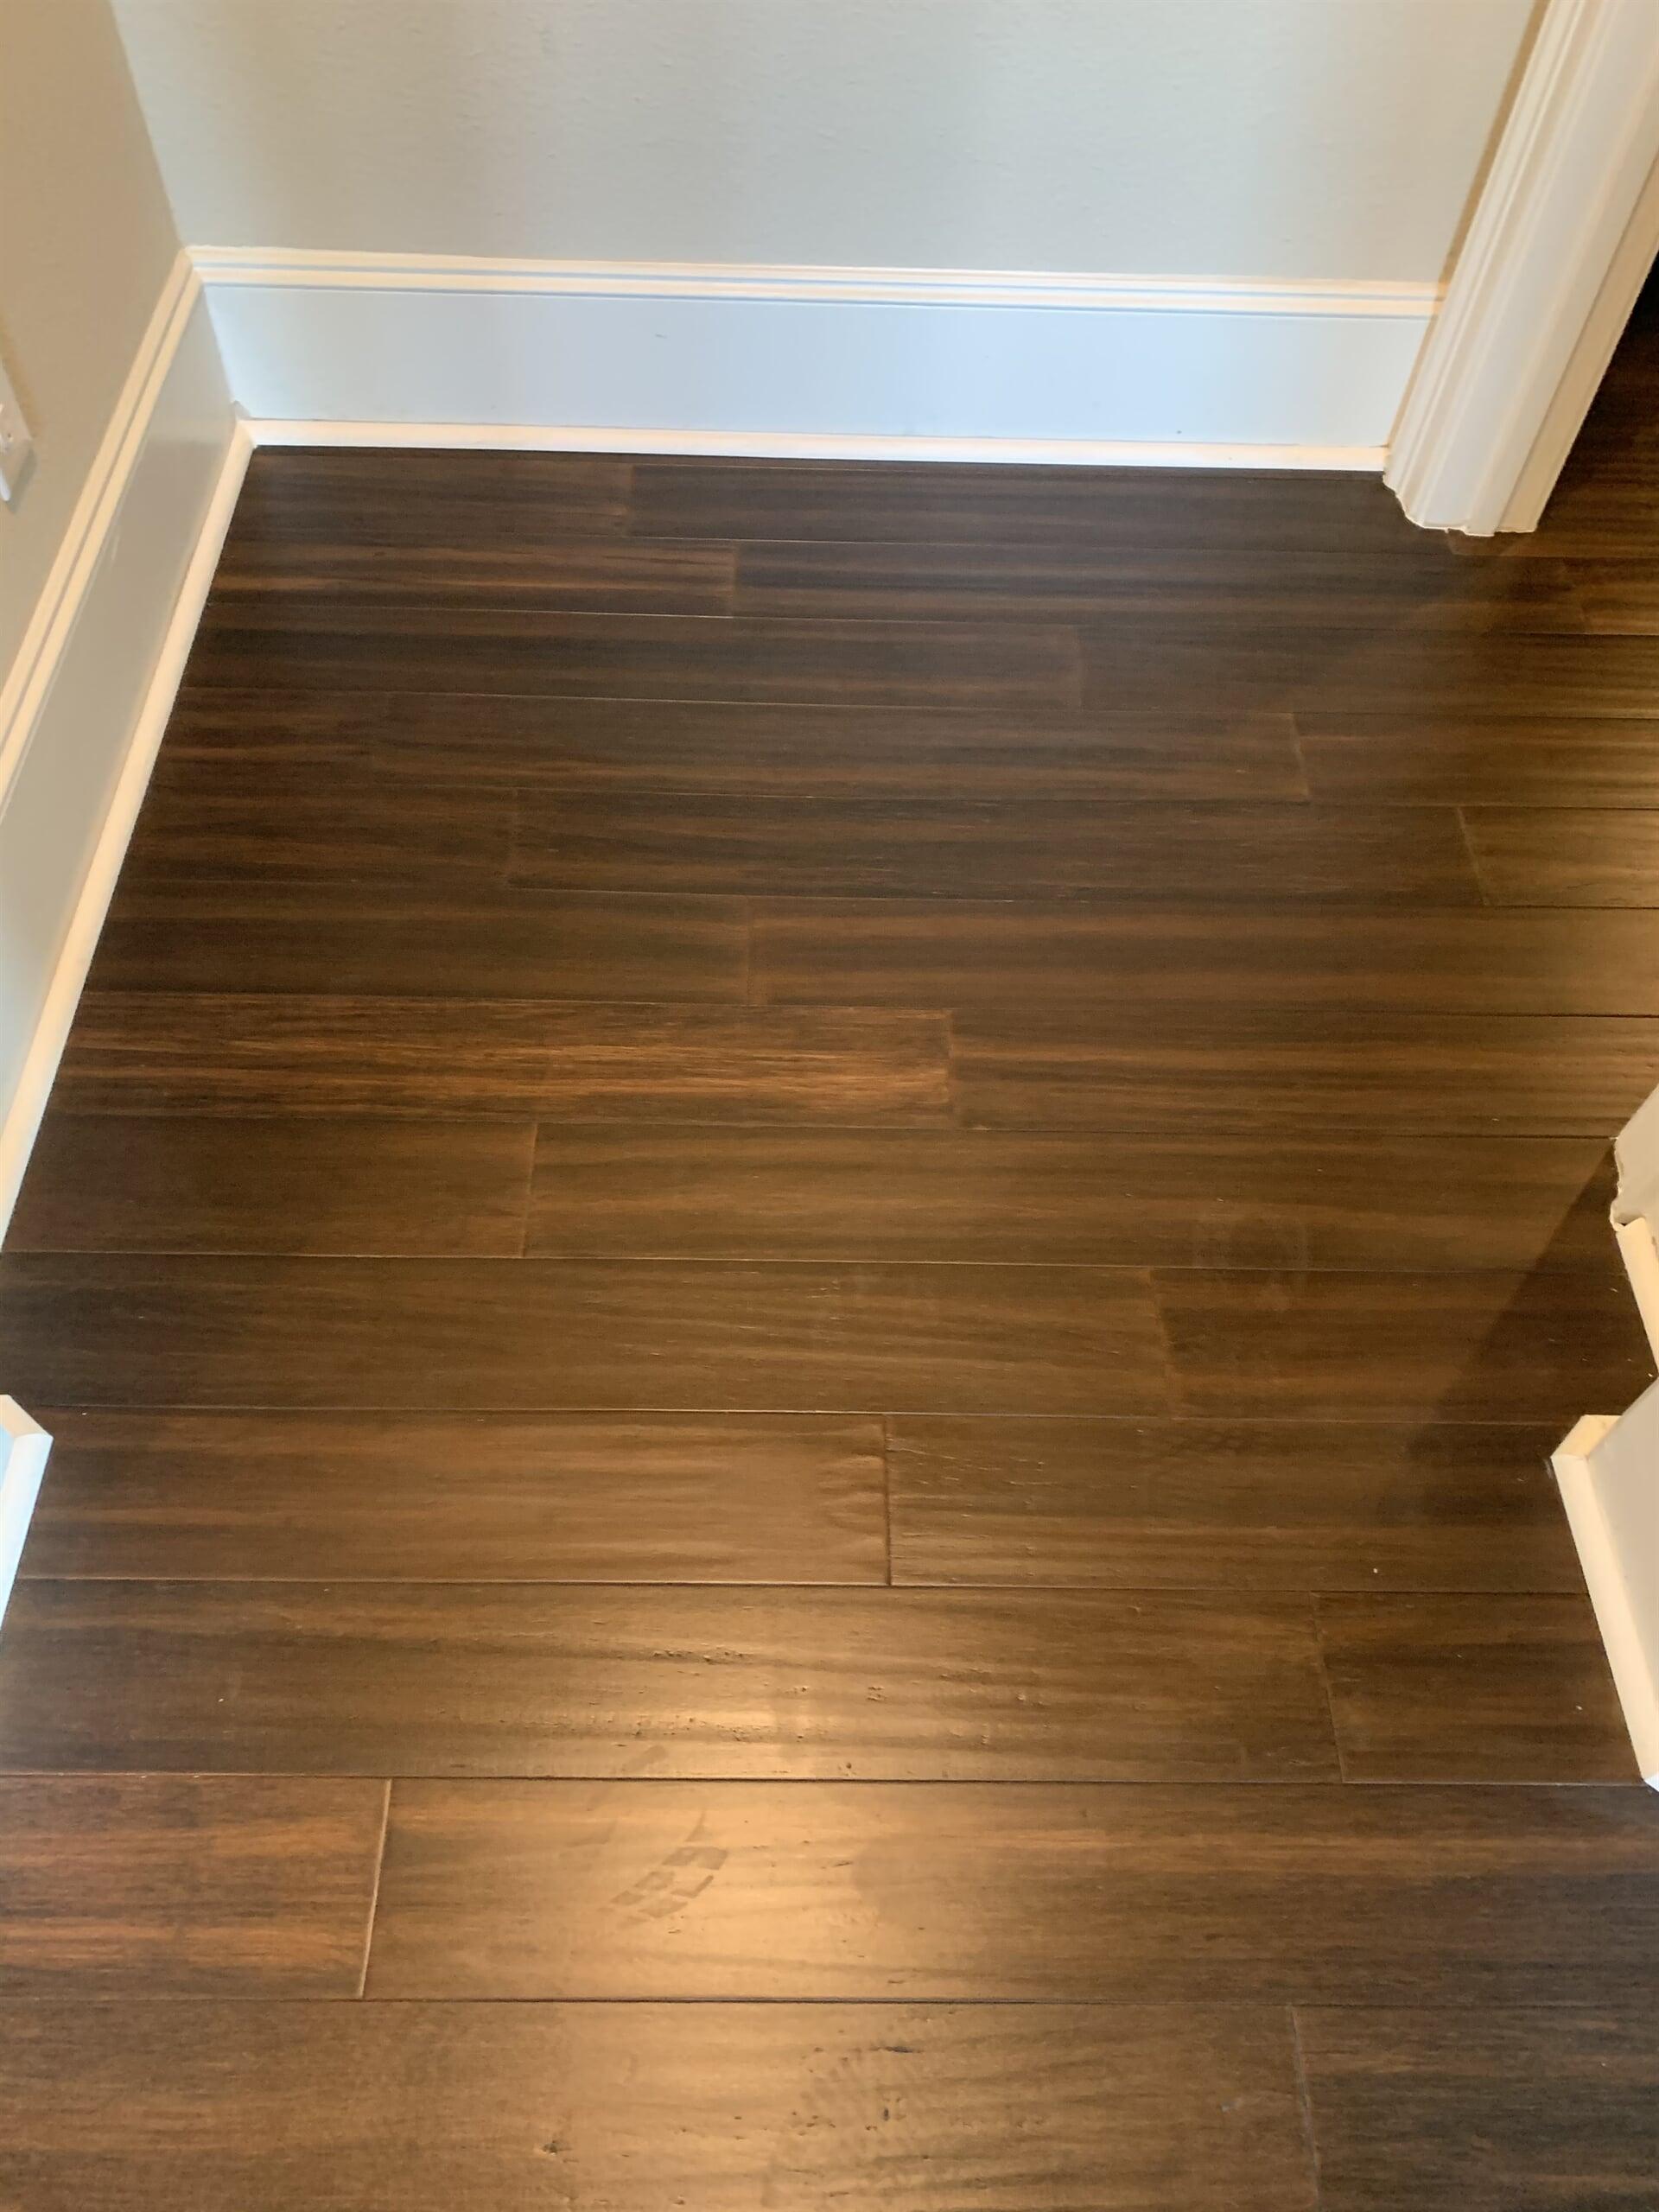 Bamboo flooring from Houston Floor Installation Services in Katy, TX